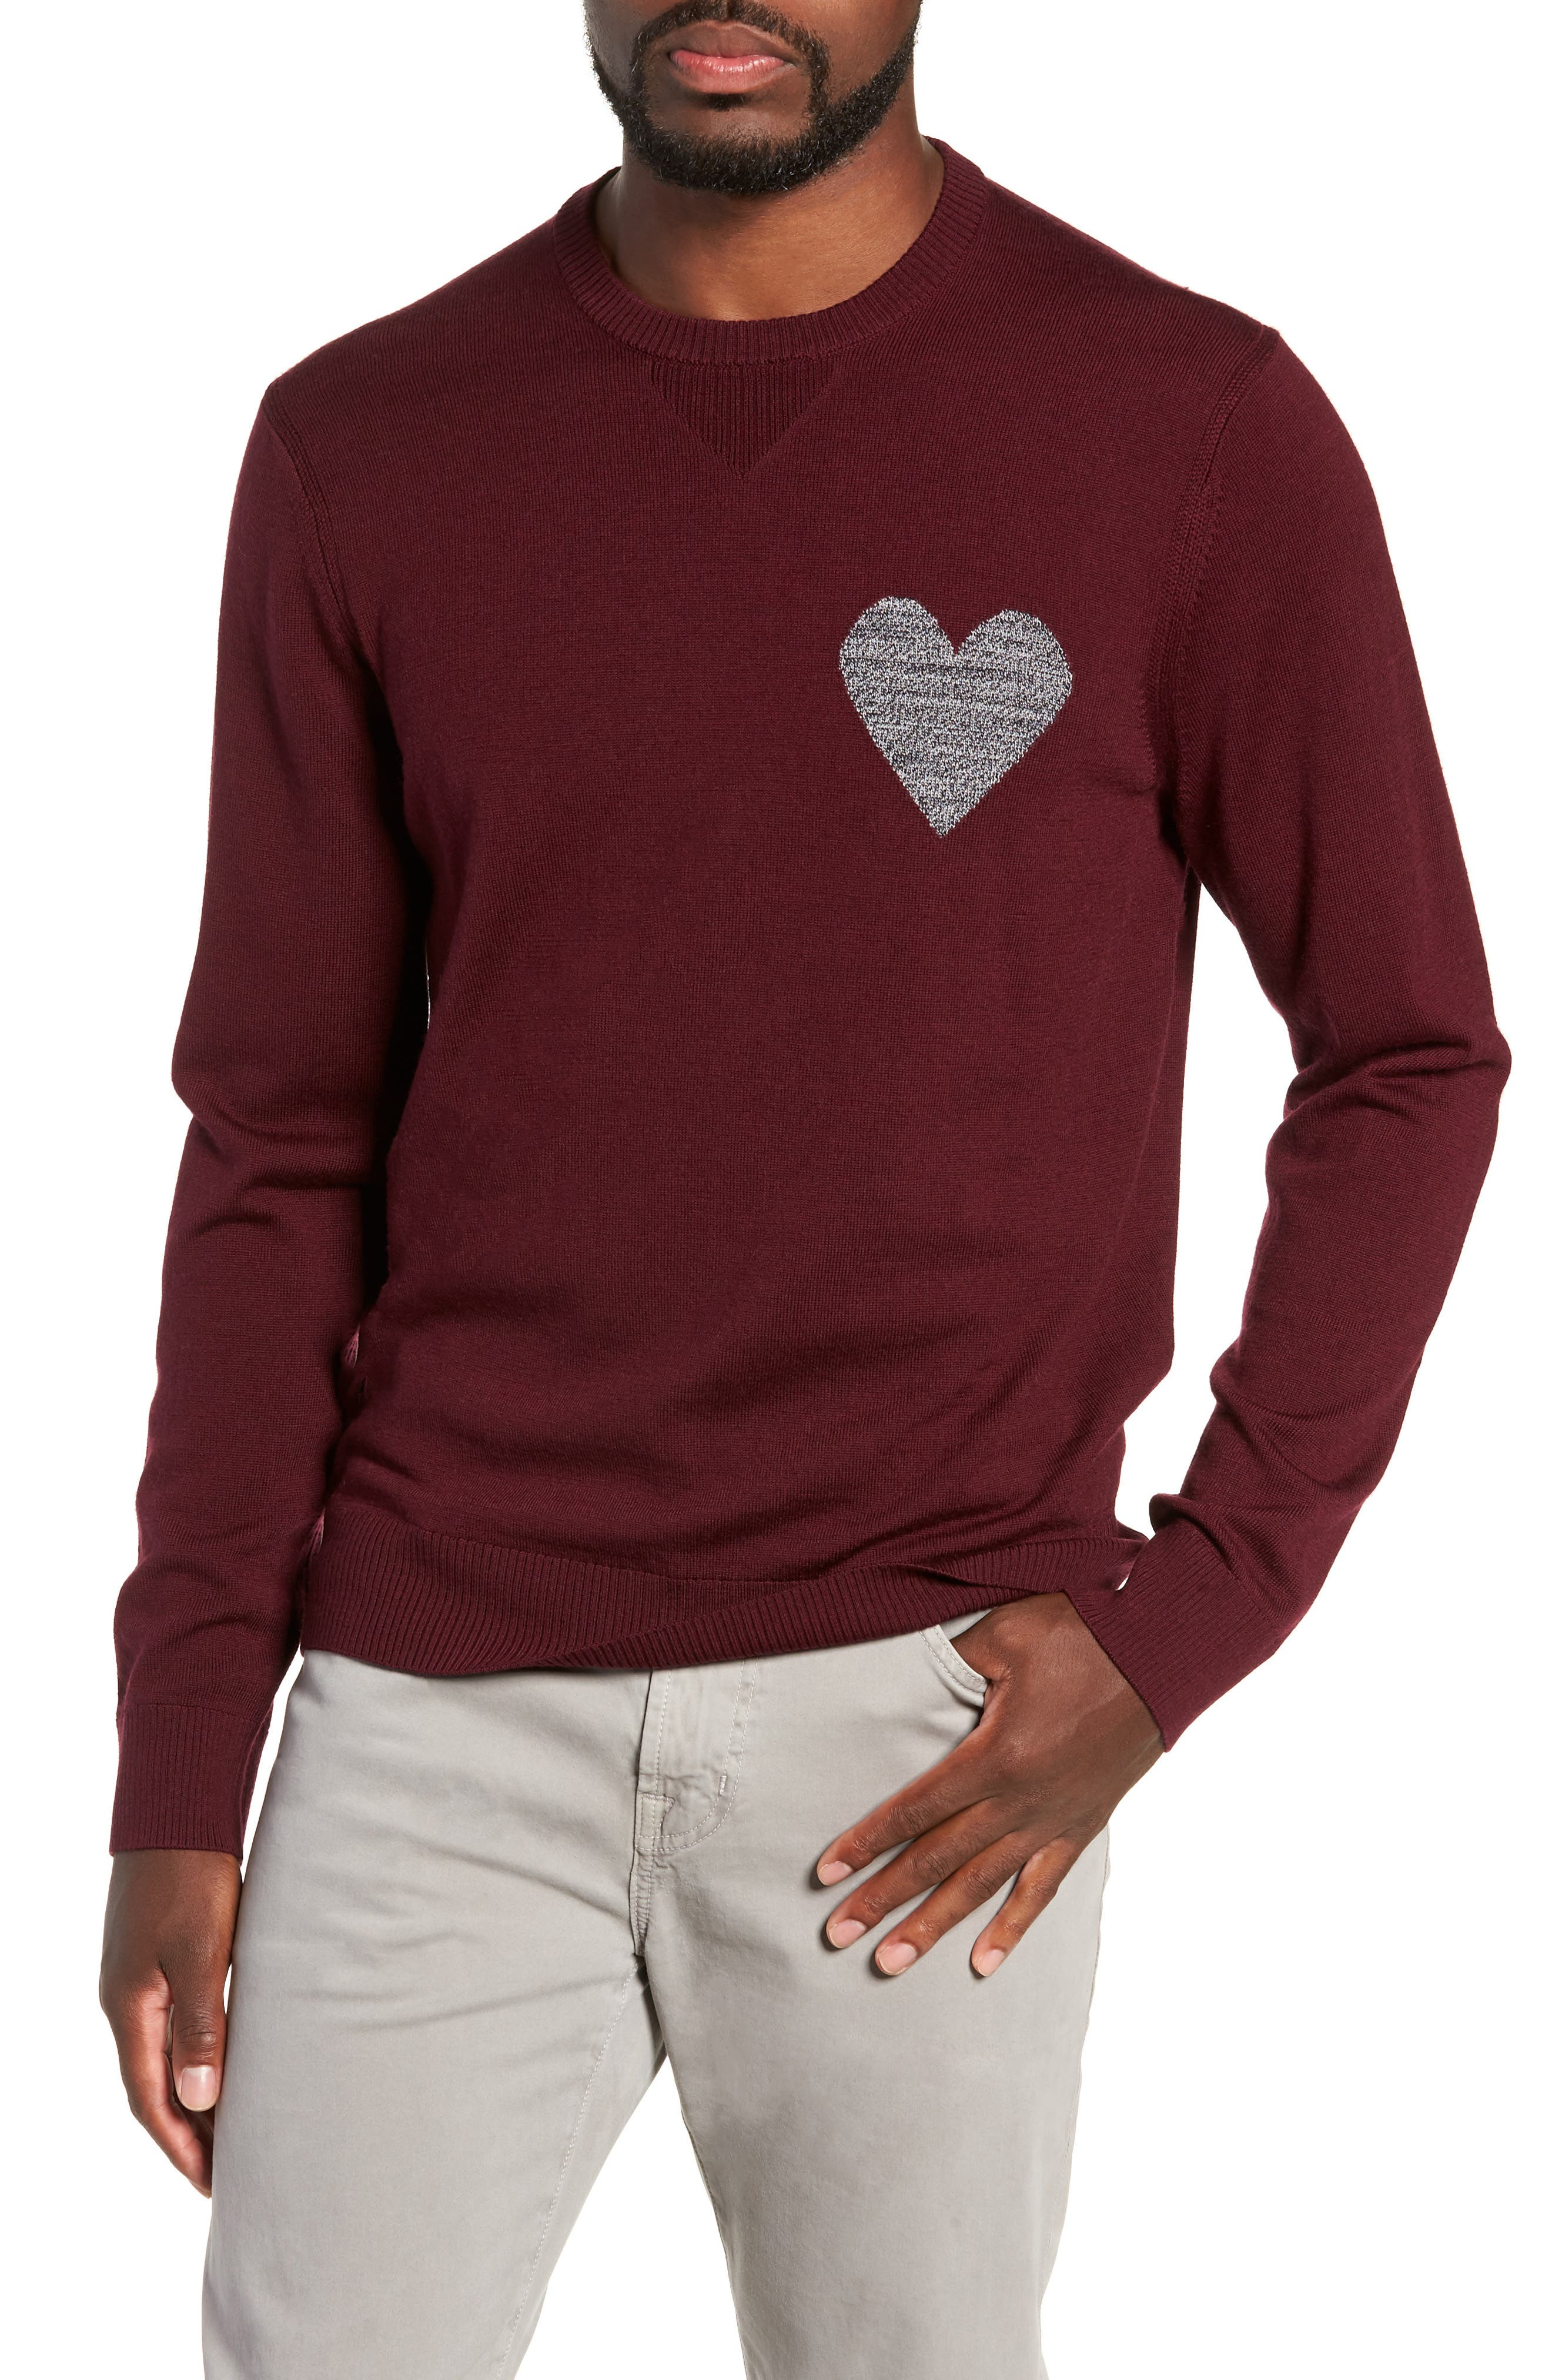 Michael Bastian Heart Intarsia Regular Fit Merino Wool Sweater